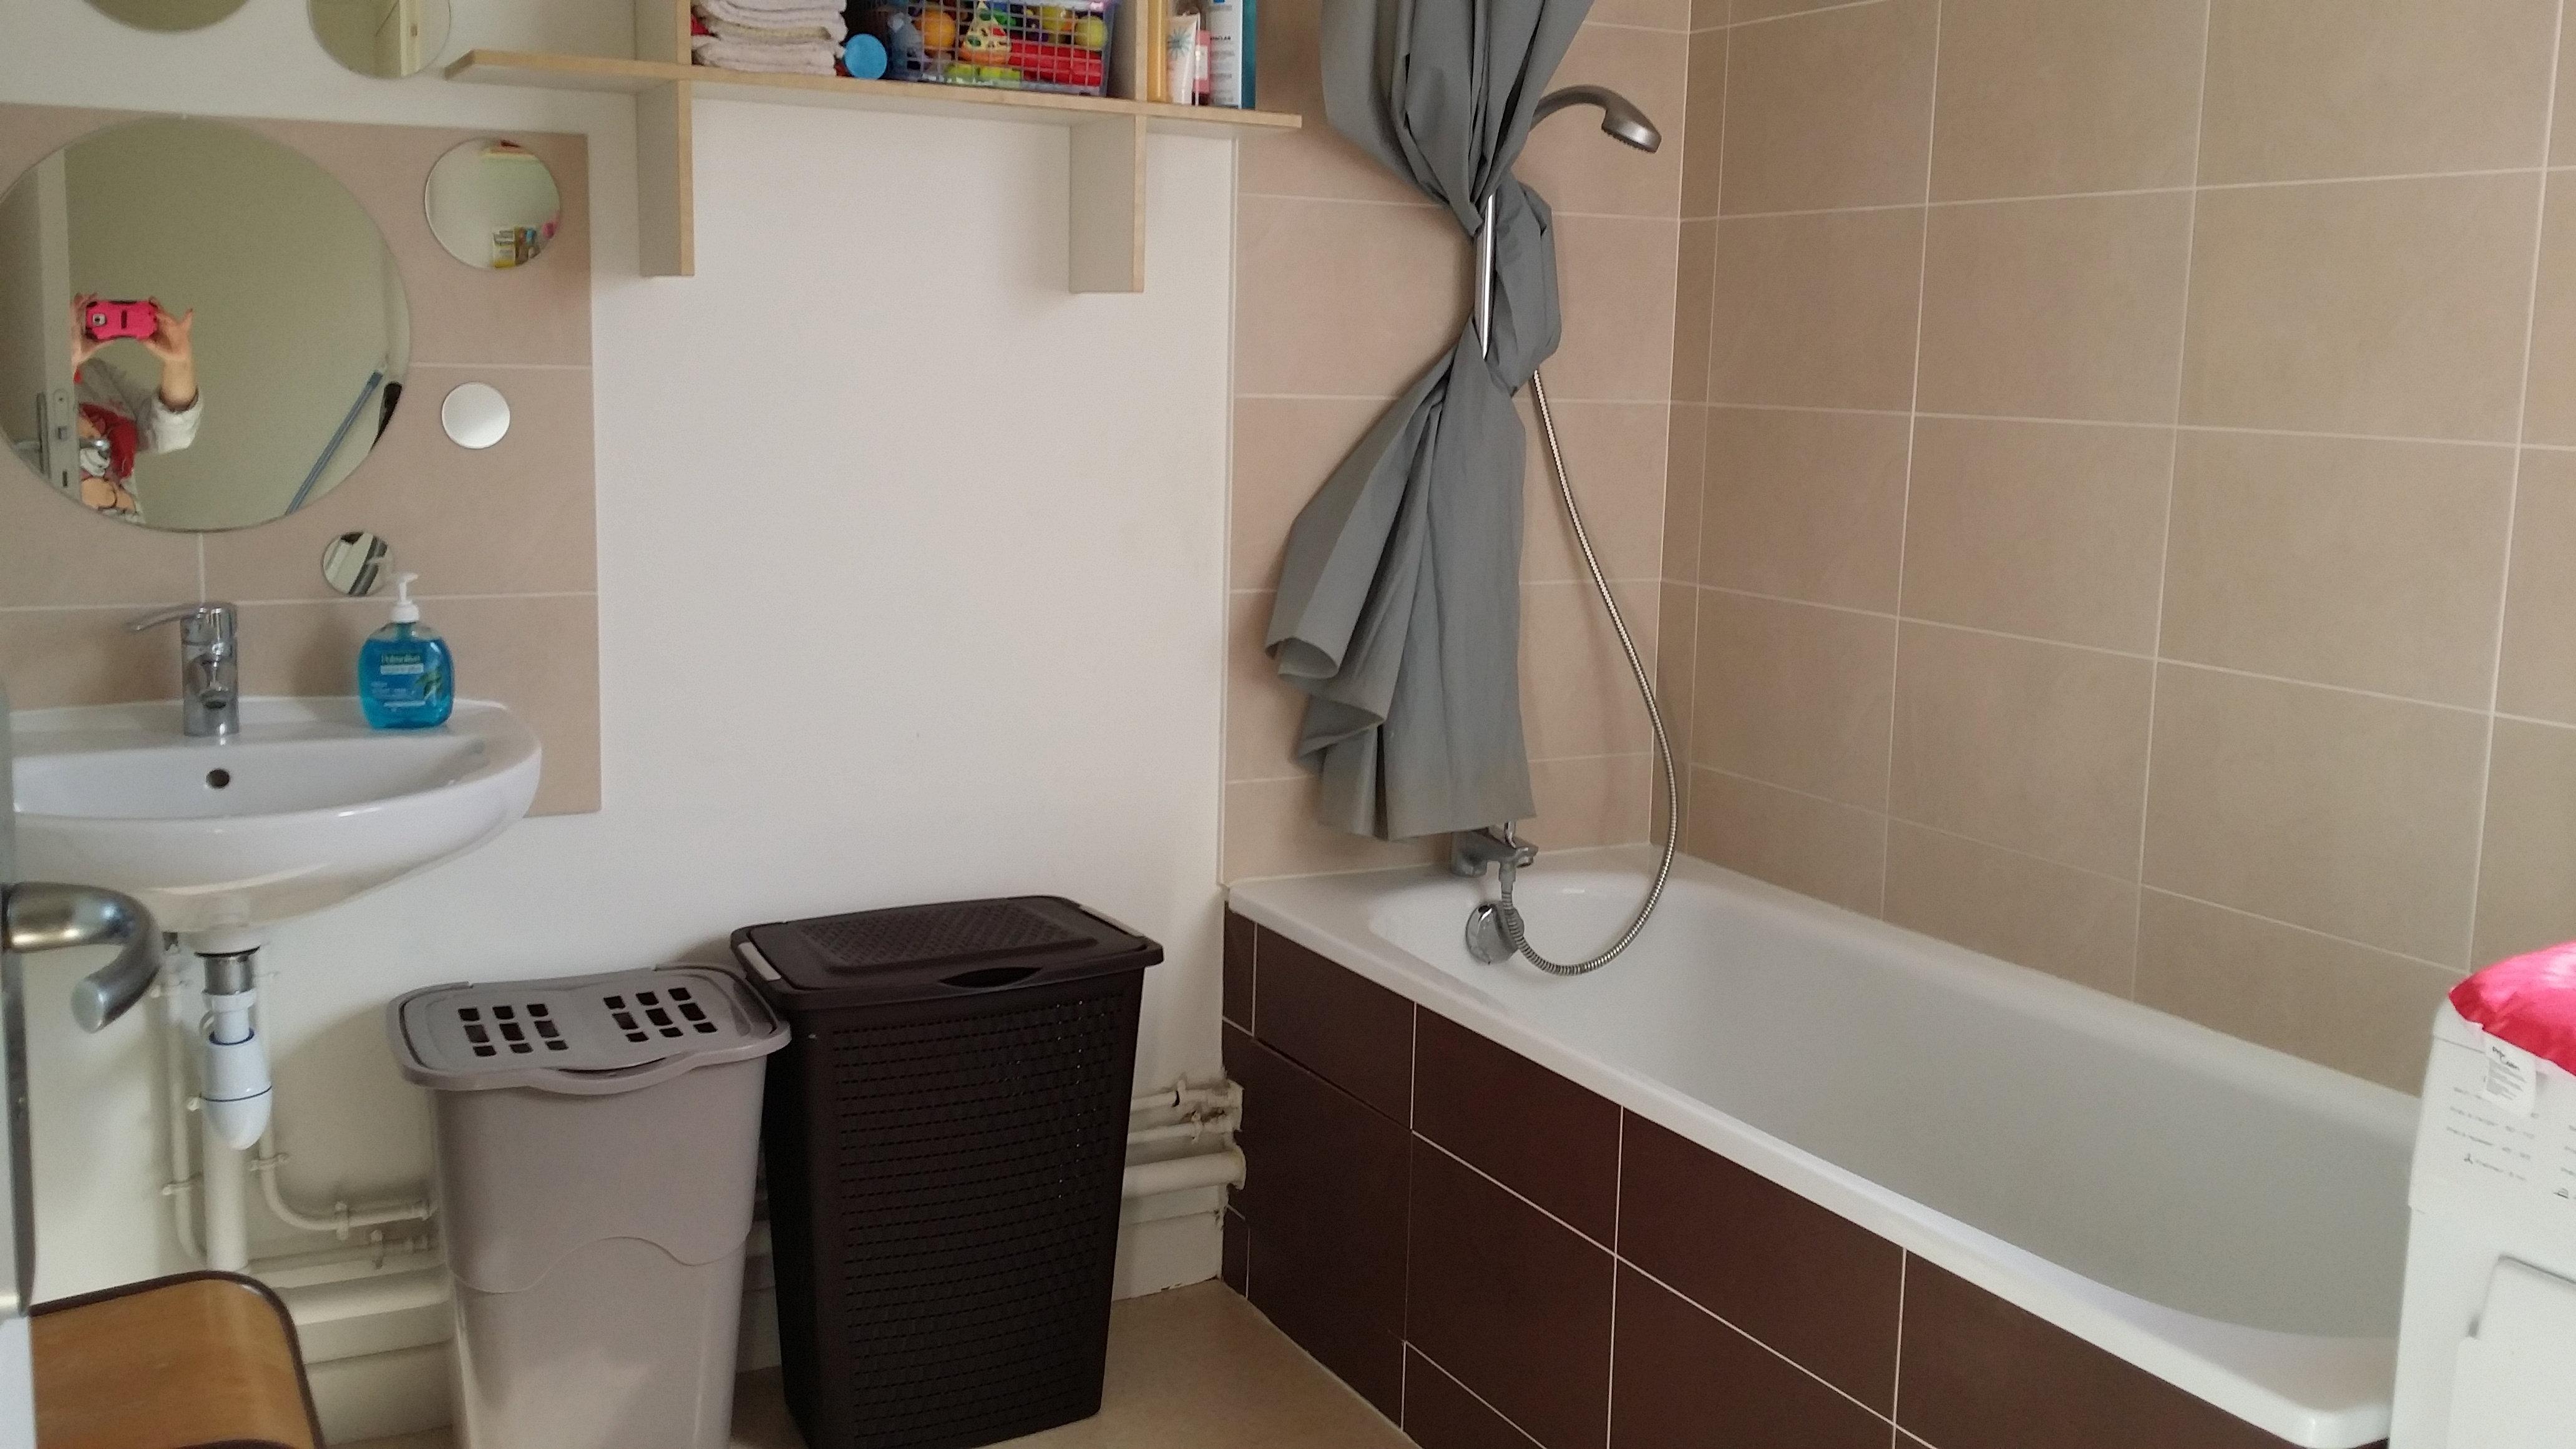 mam'conseils | récupérer joint salle de bain, dentifrice ... - Moisissure Joint Salle De Bain